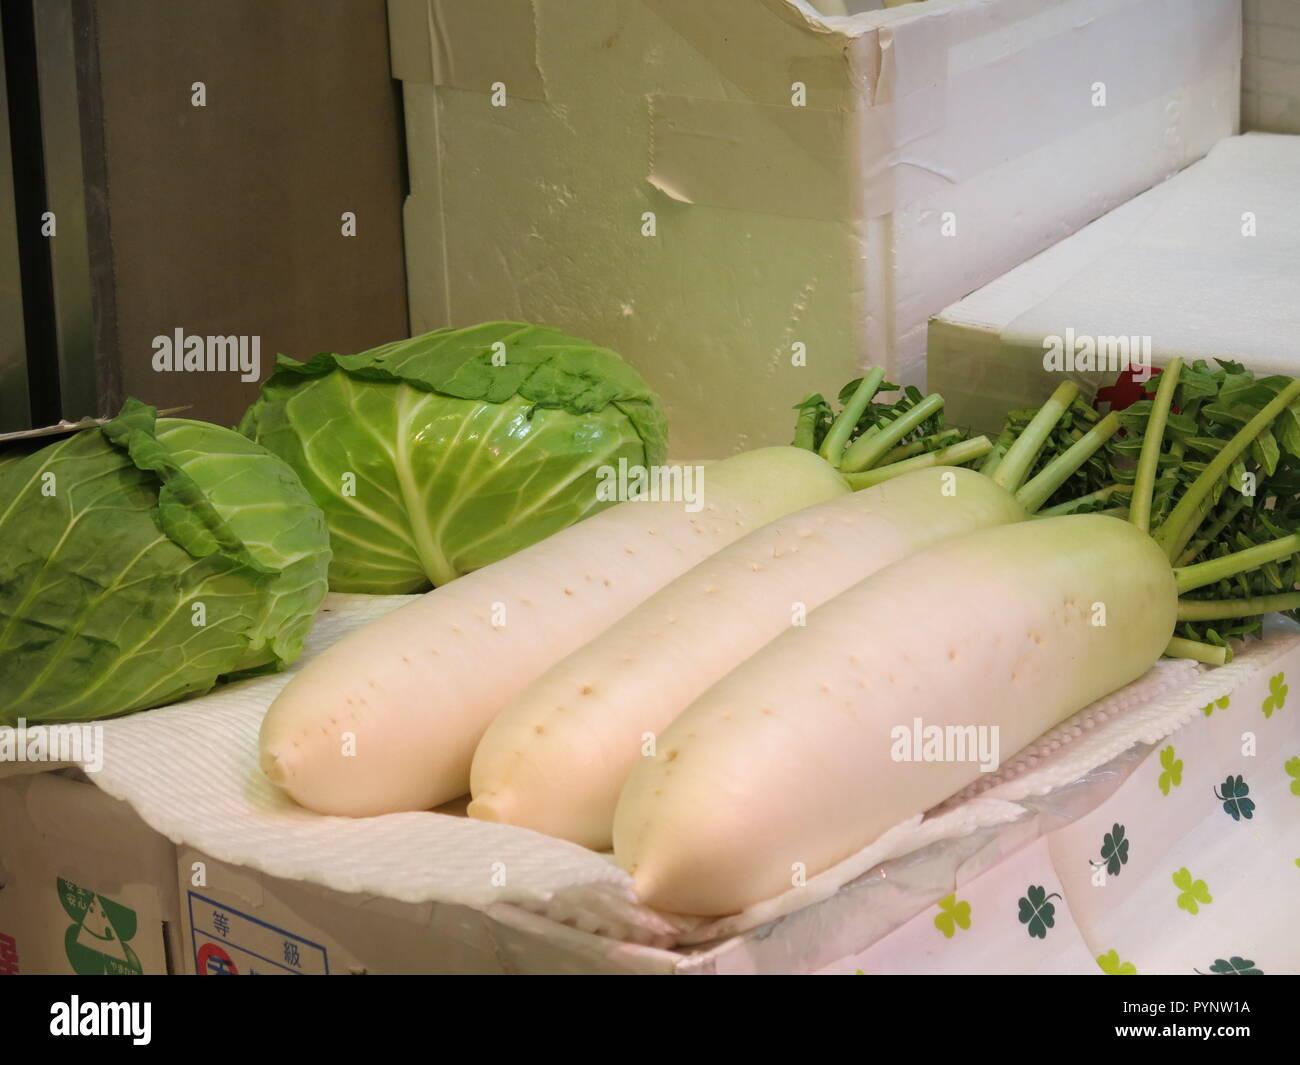 Three large white radishes in a Japanese street market - Stock Image